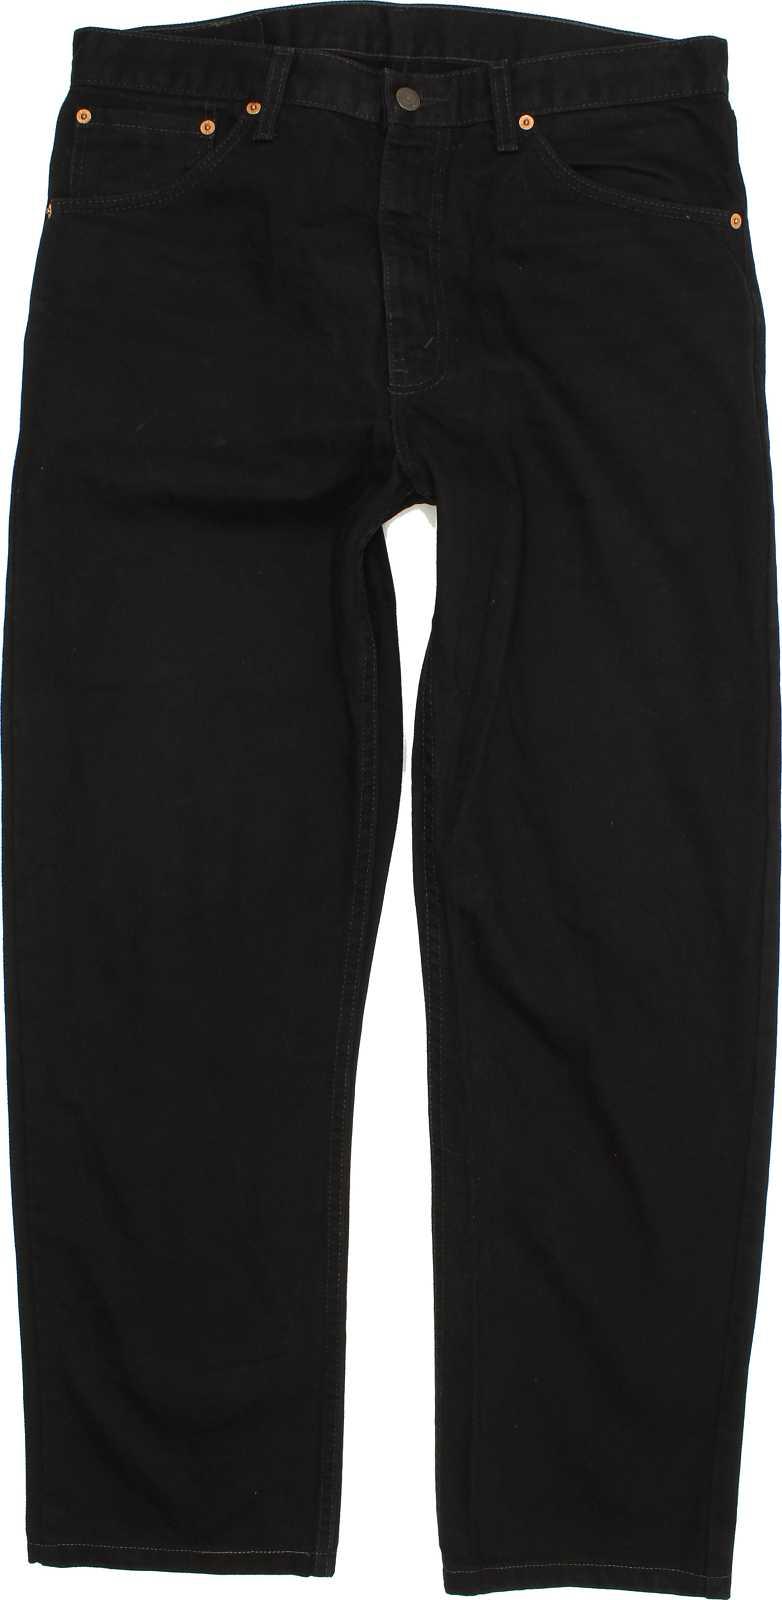 Levi-039-s-521-Herren-Schwarz-Straight-Jeans-W34-L30-40617